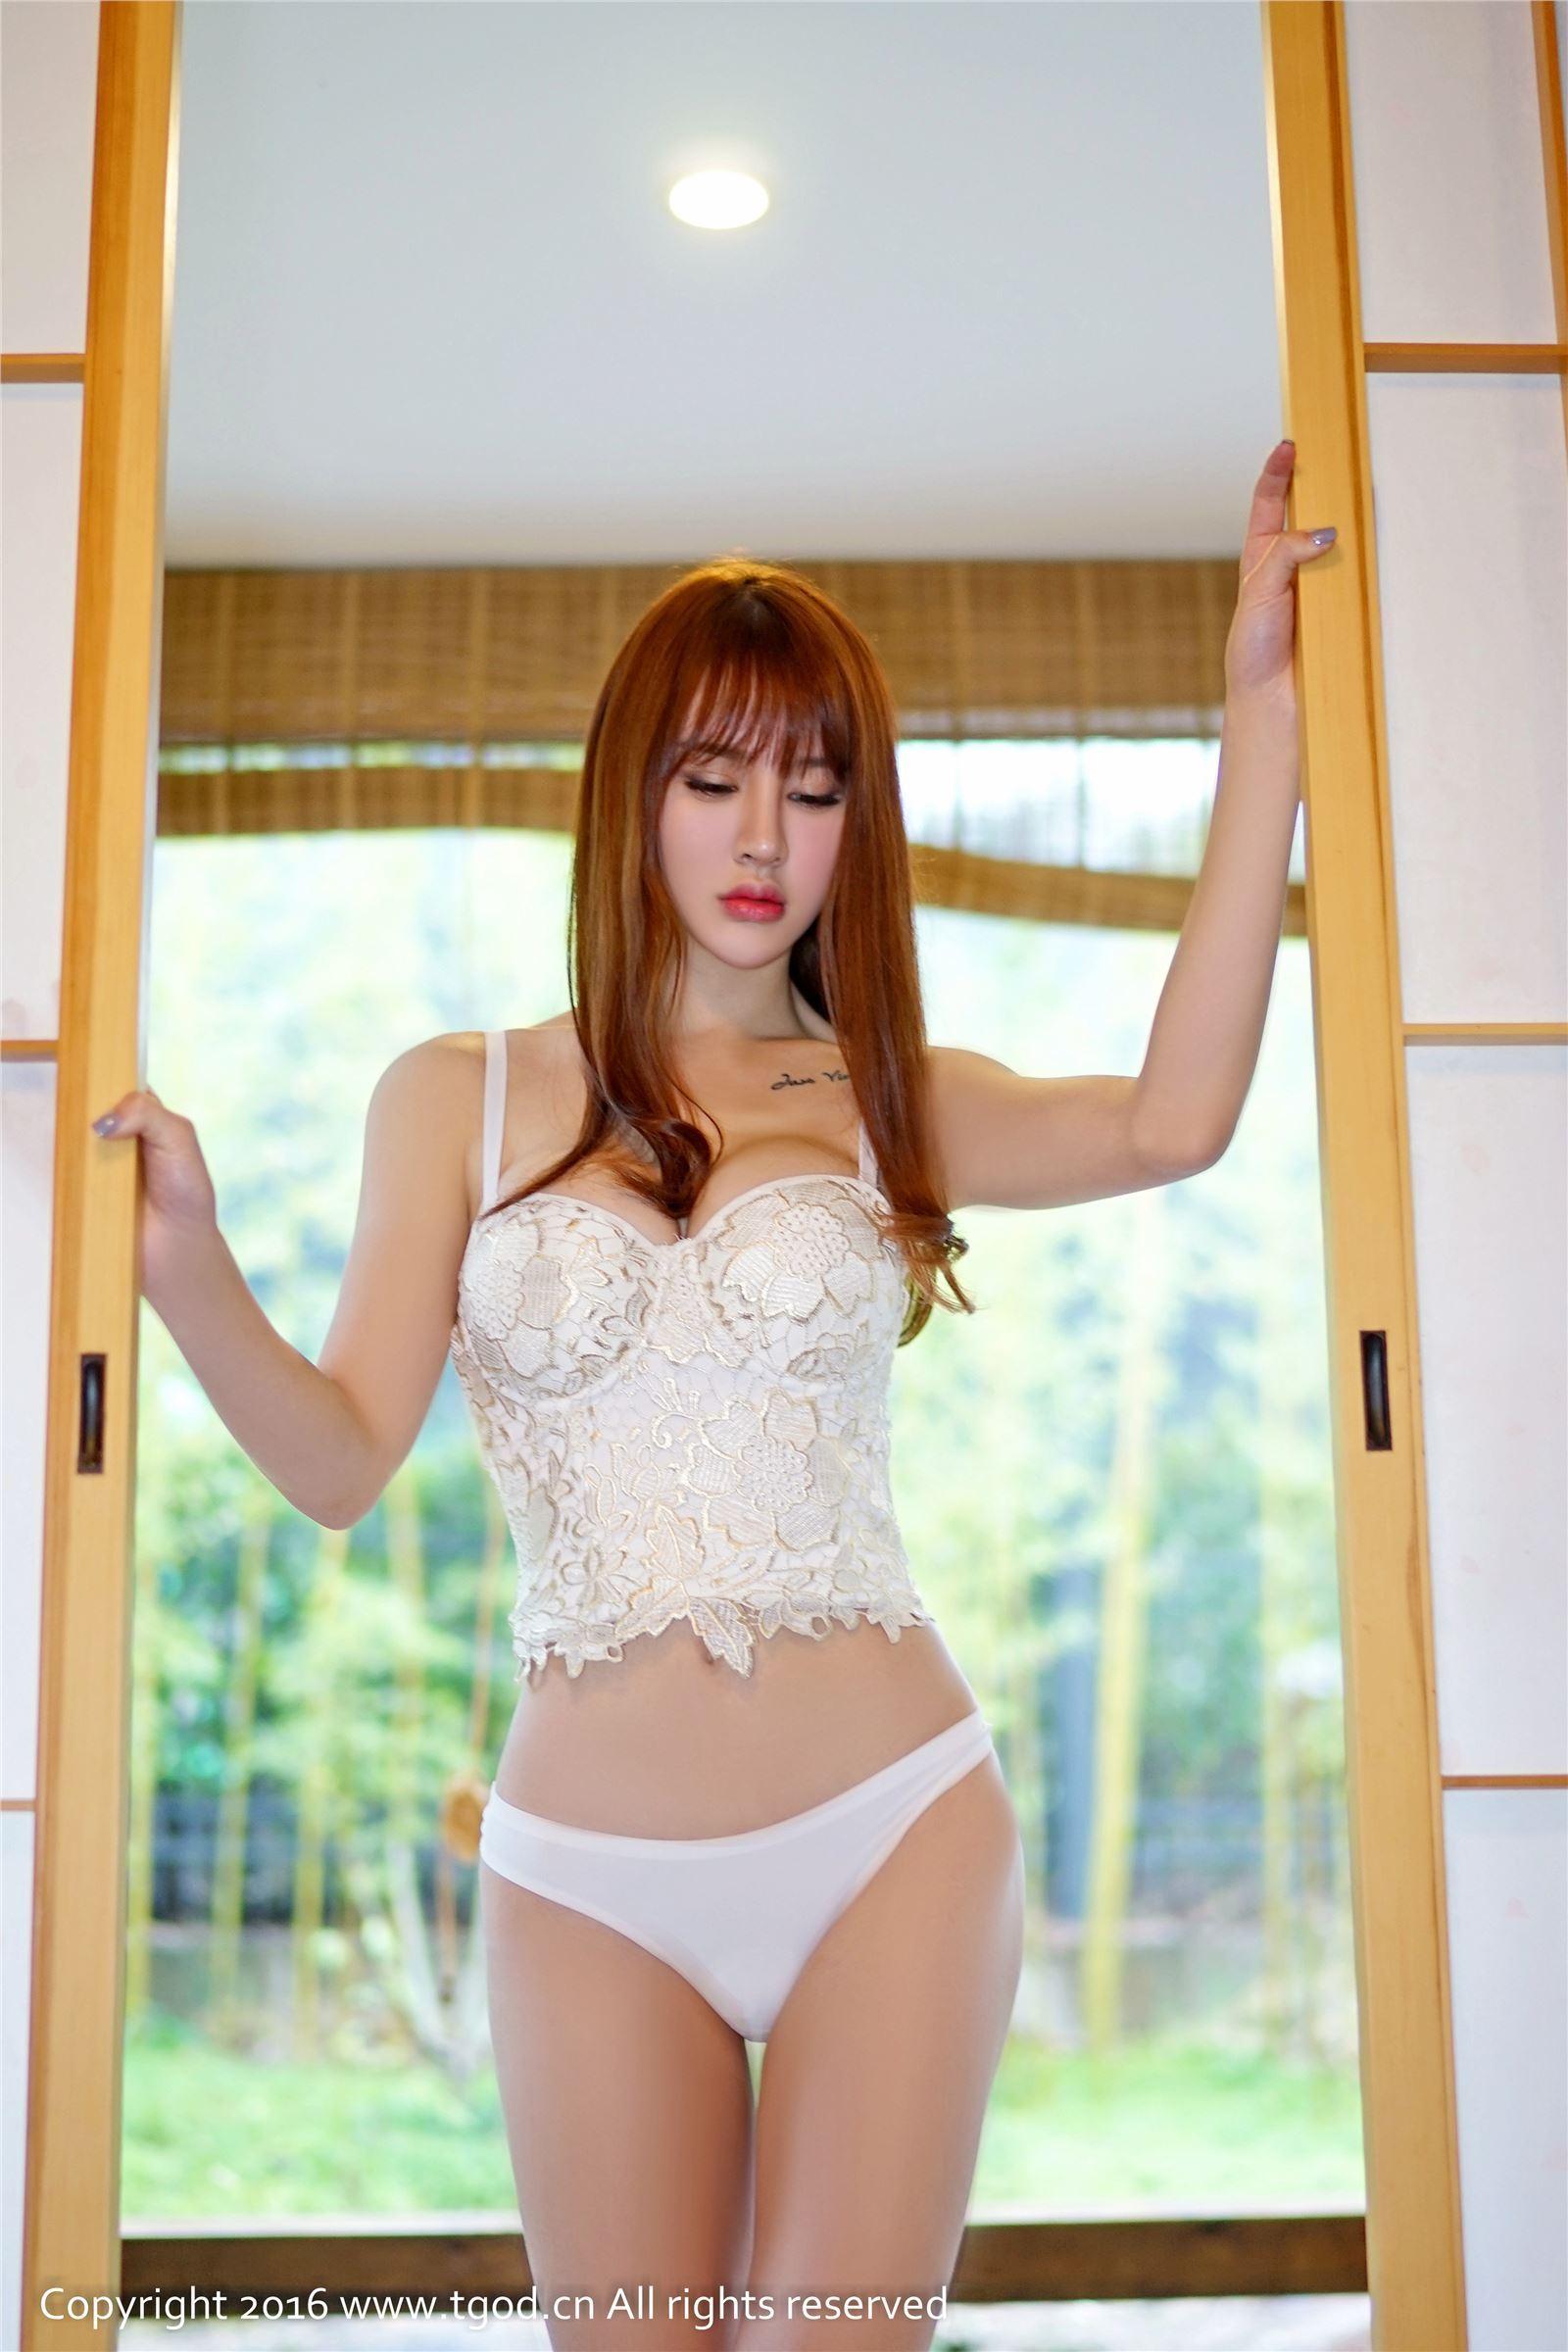 TGOD 推女神 2016-03-09 Cheryl青树 淡淡羞涩女神范